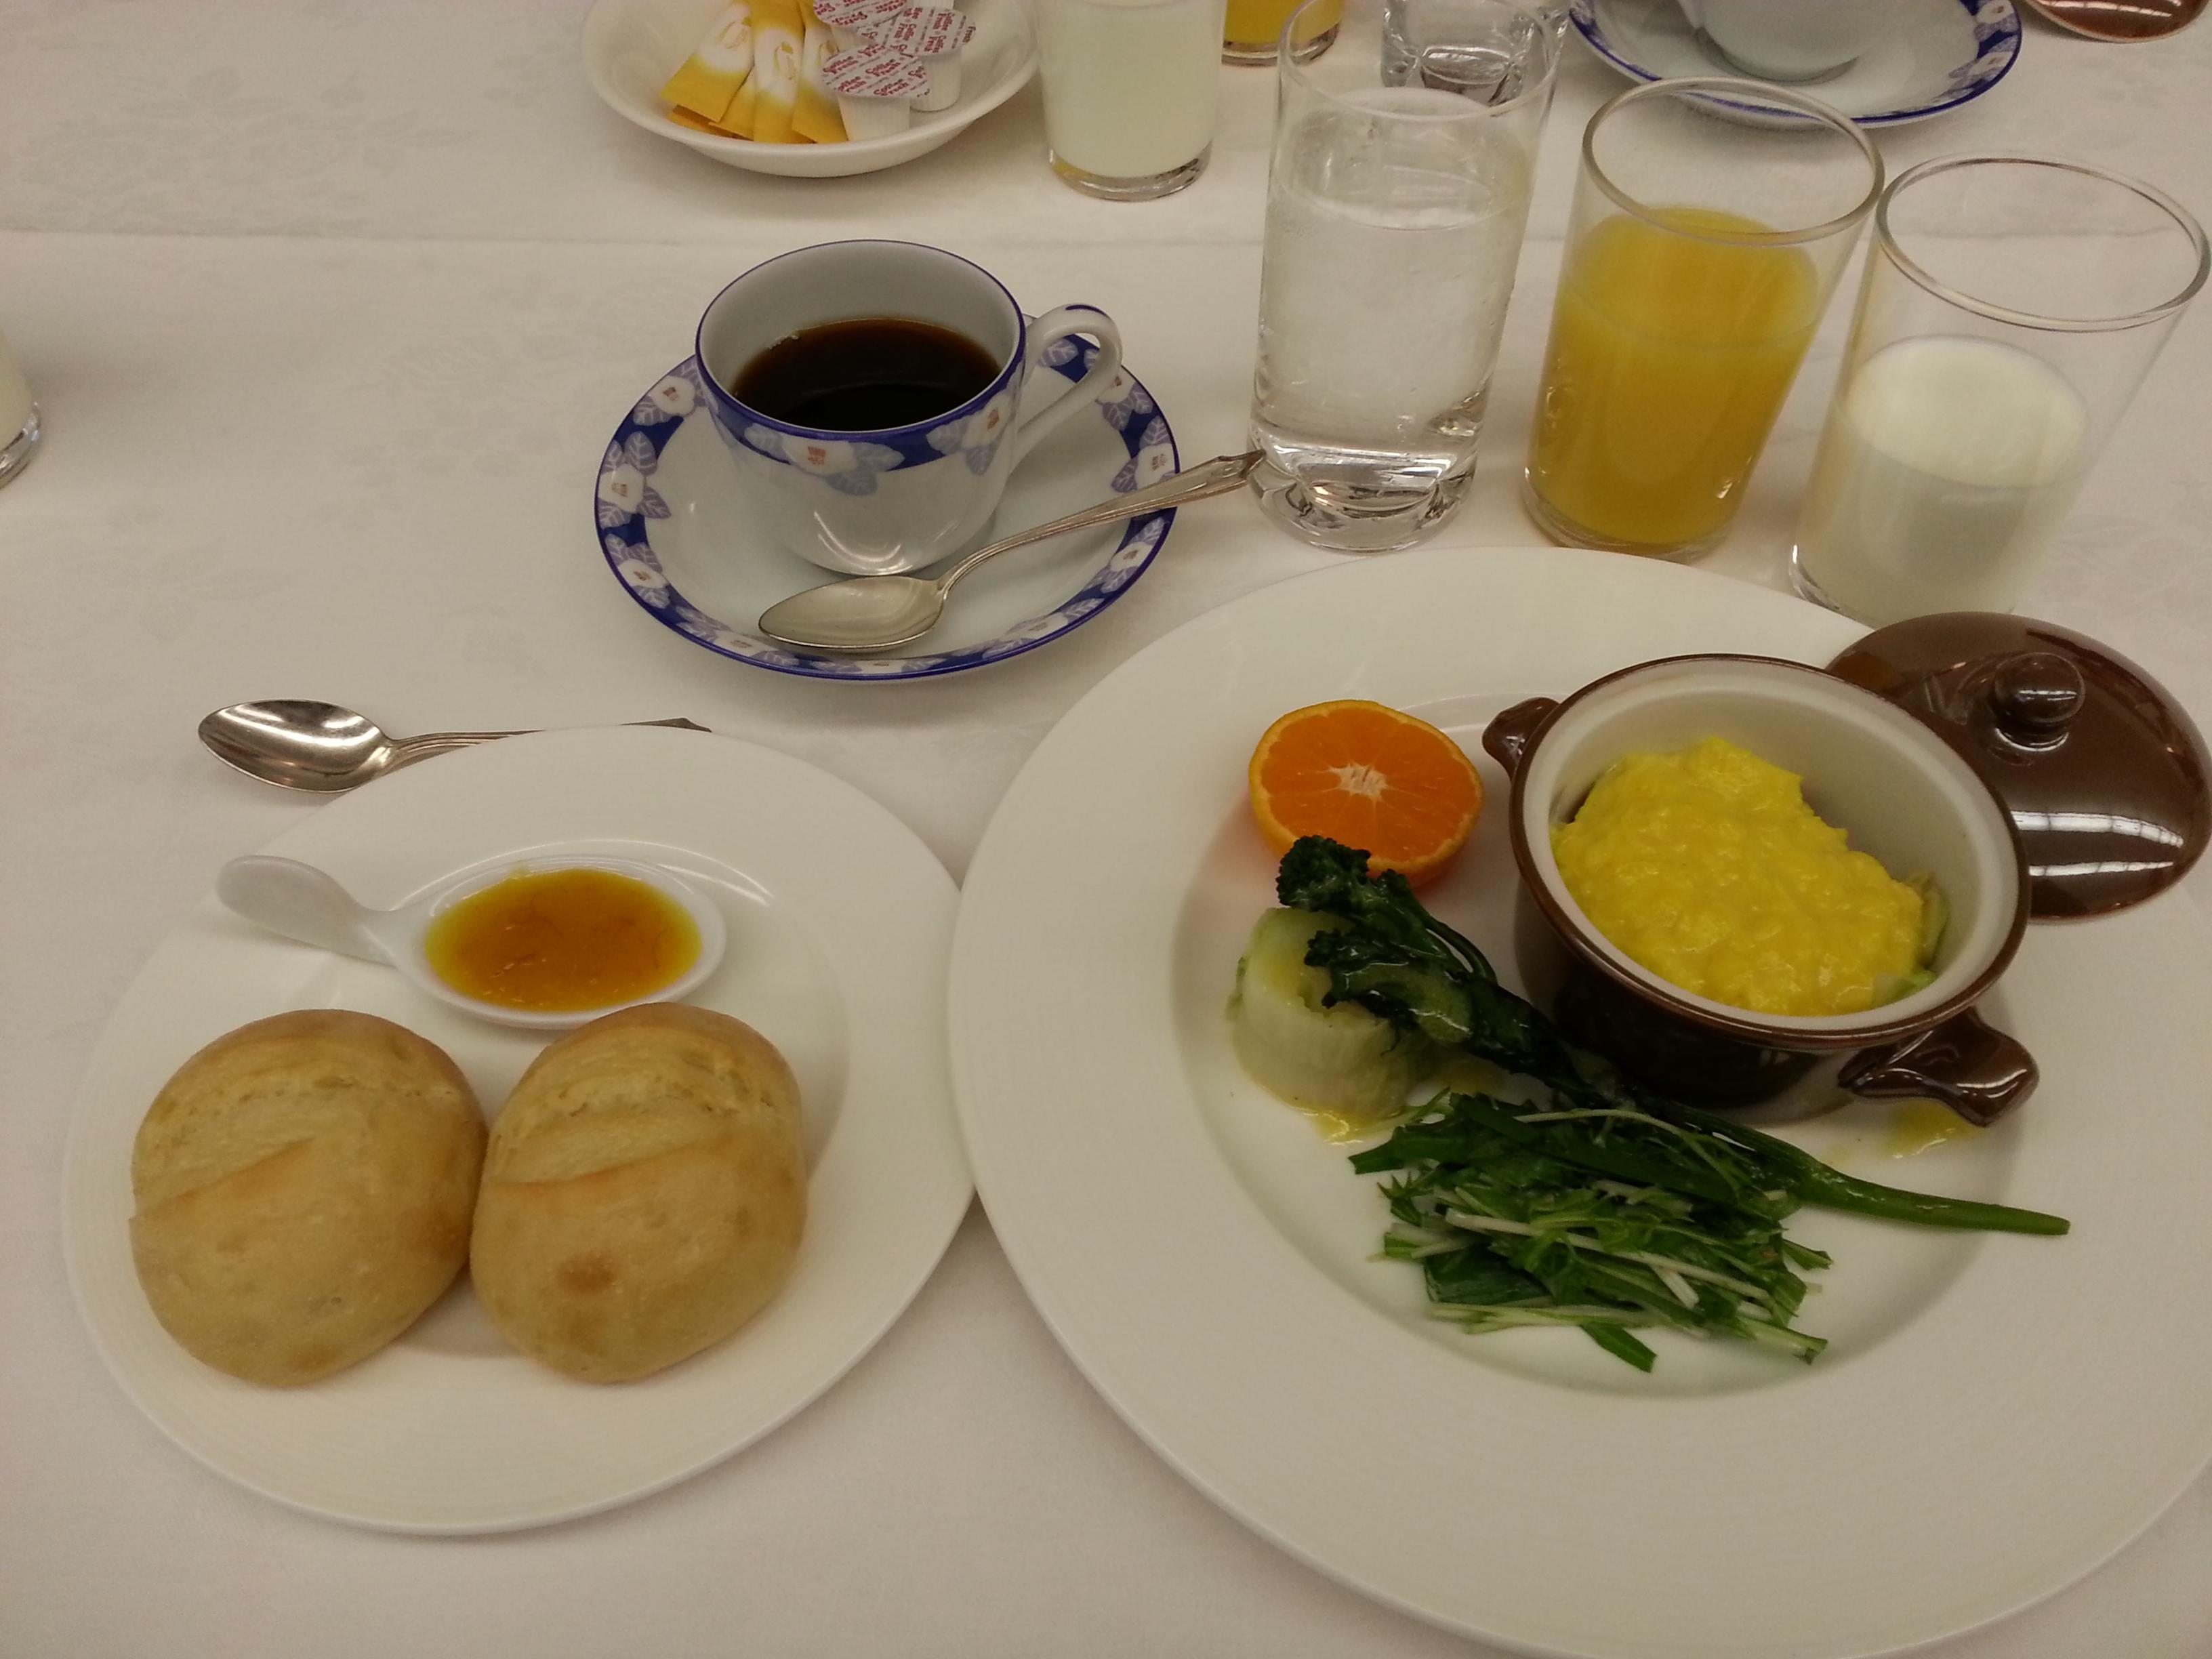 JFEホールディングスの馬田一氏が、2周年記念第18回エシカル朝食会で講演